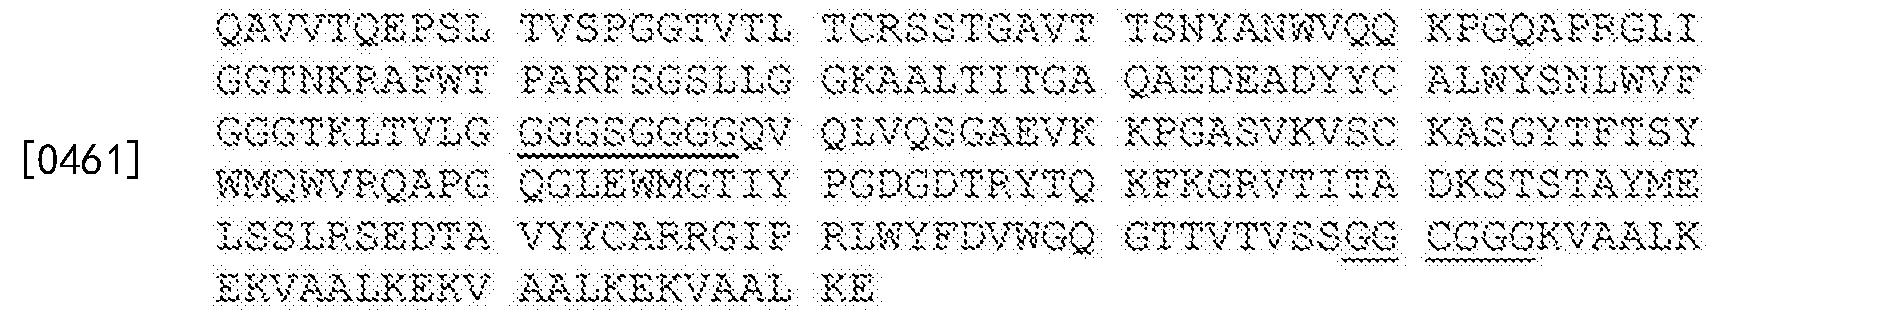 Figure CN107827985AD00611